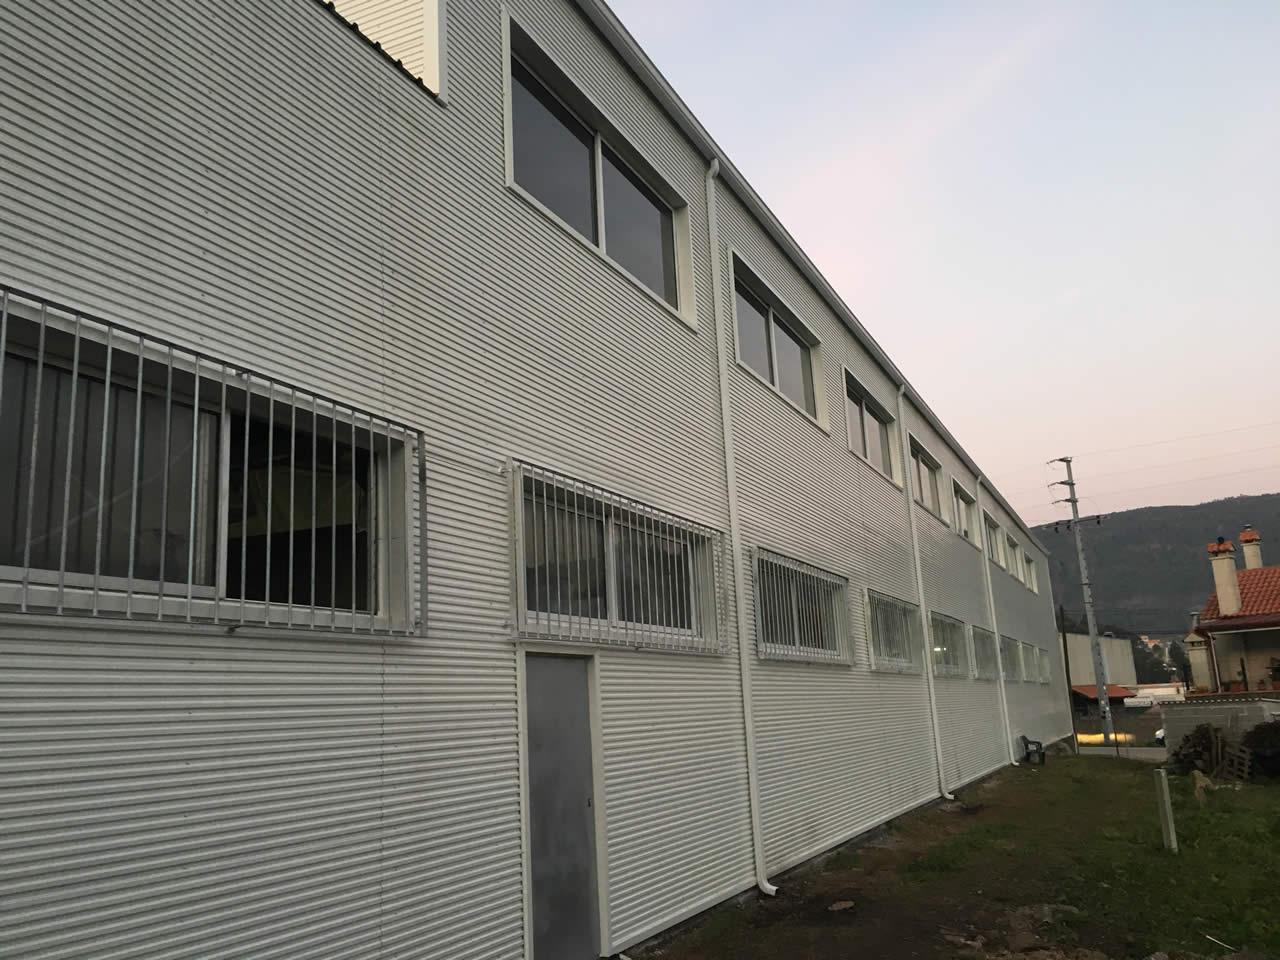 Revestimiento fachadas naves industriales pontevedra for Calefactores para naves industriales